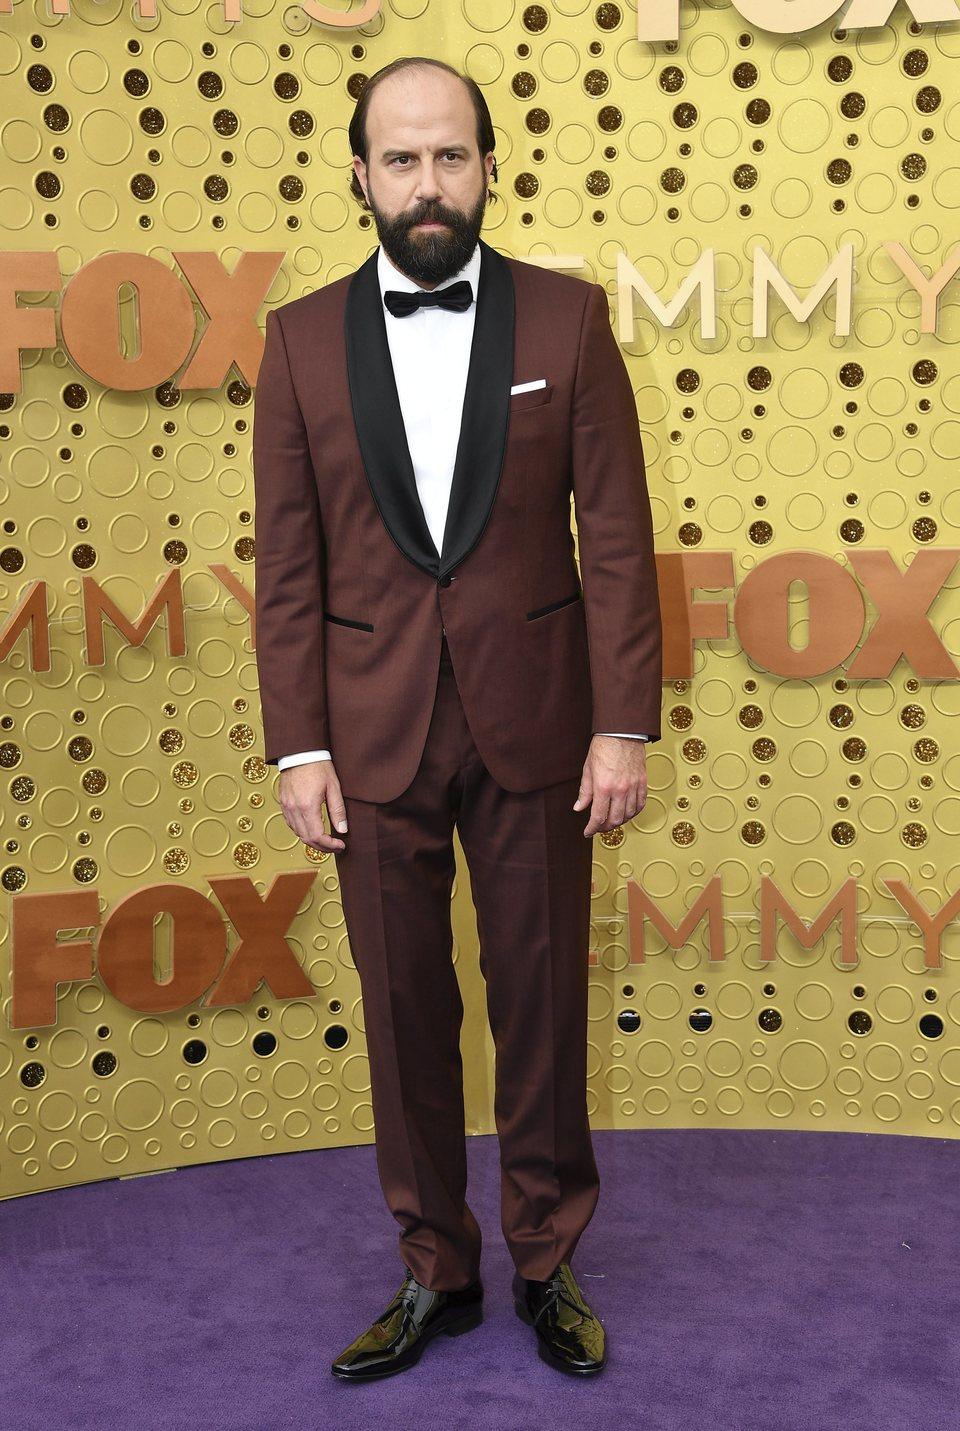 Brett Gelman at the Emmy 2019 red carpet